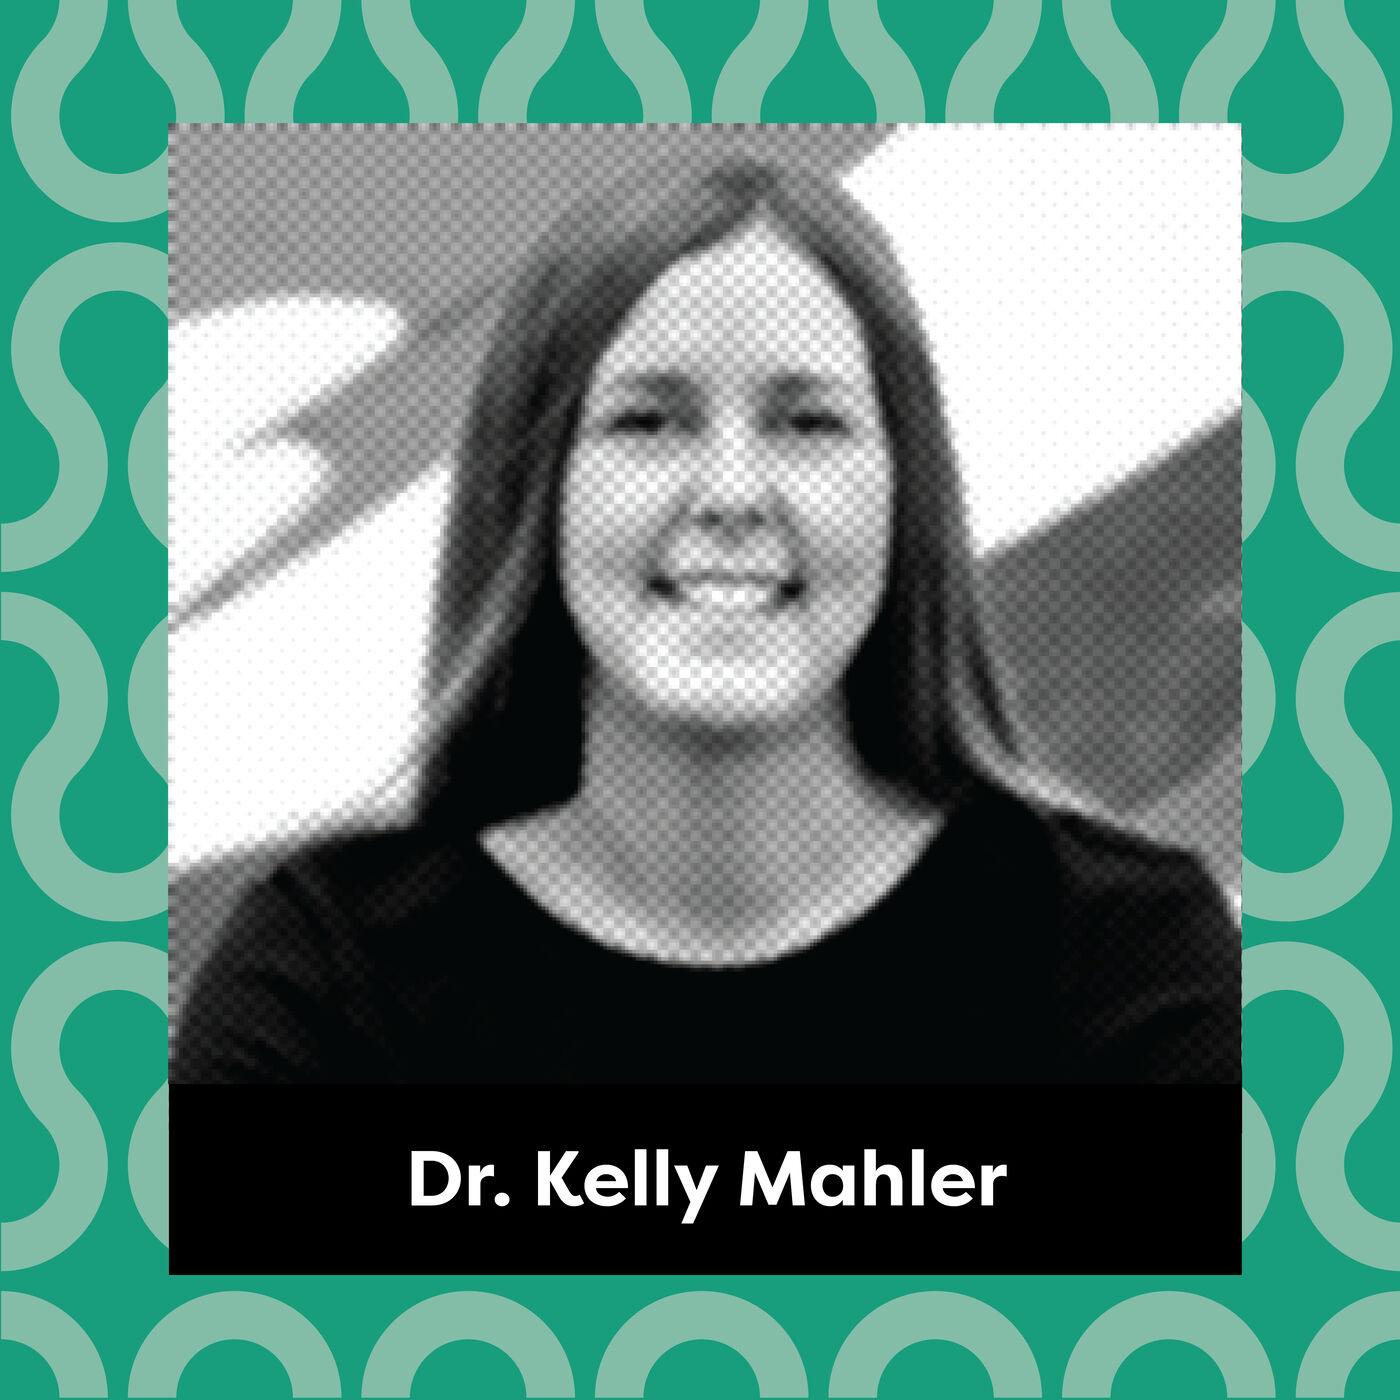 Ep. 133: Dr. Kelly Mahler - Interoception & Executive Function